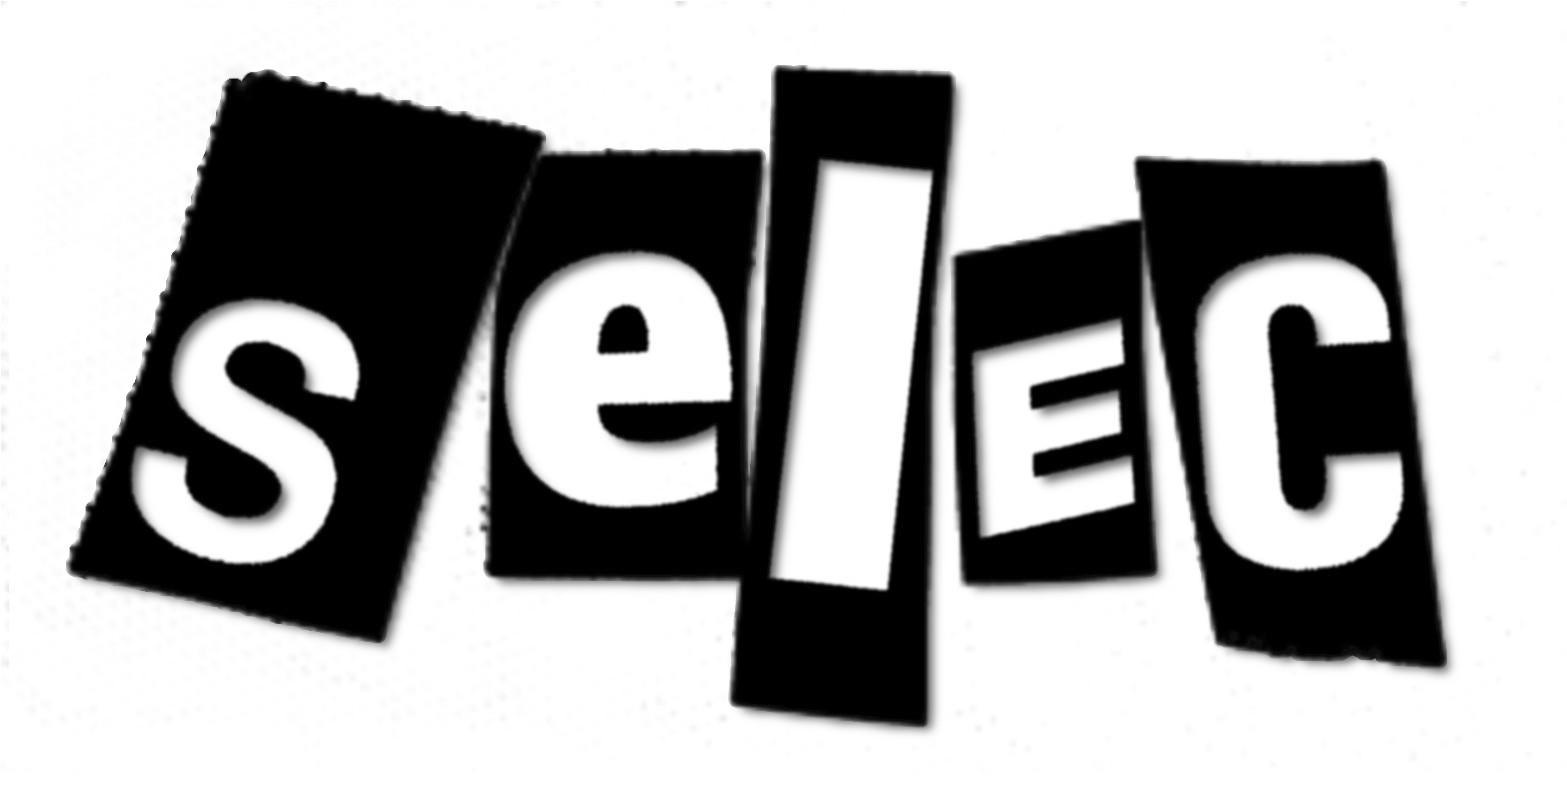 selec_schippsel_bw_invert2